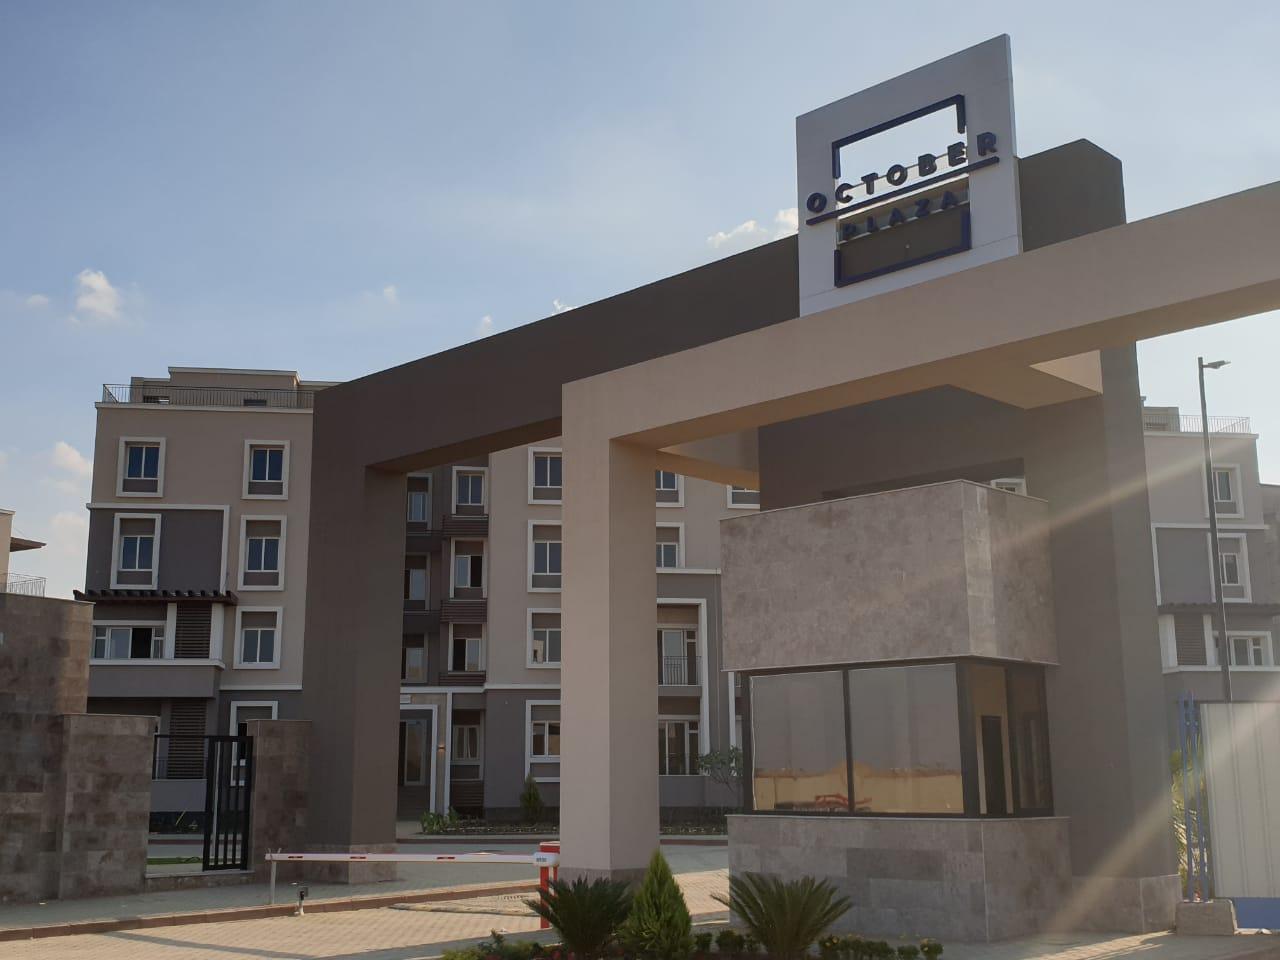 October-Plaza-SODIC